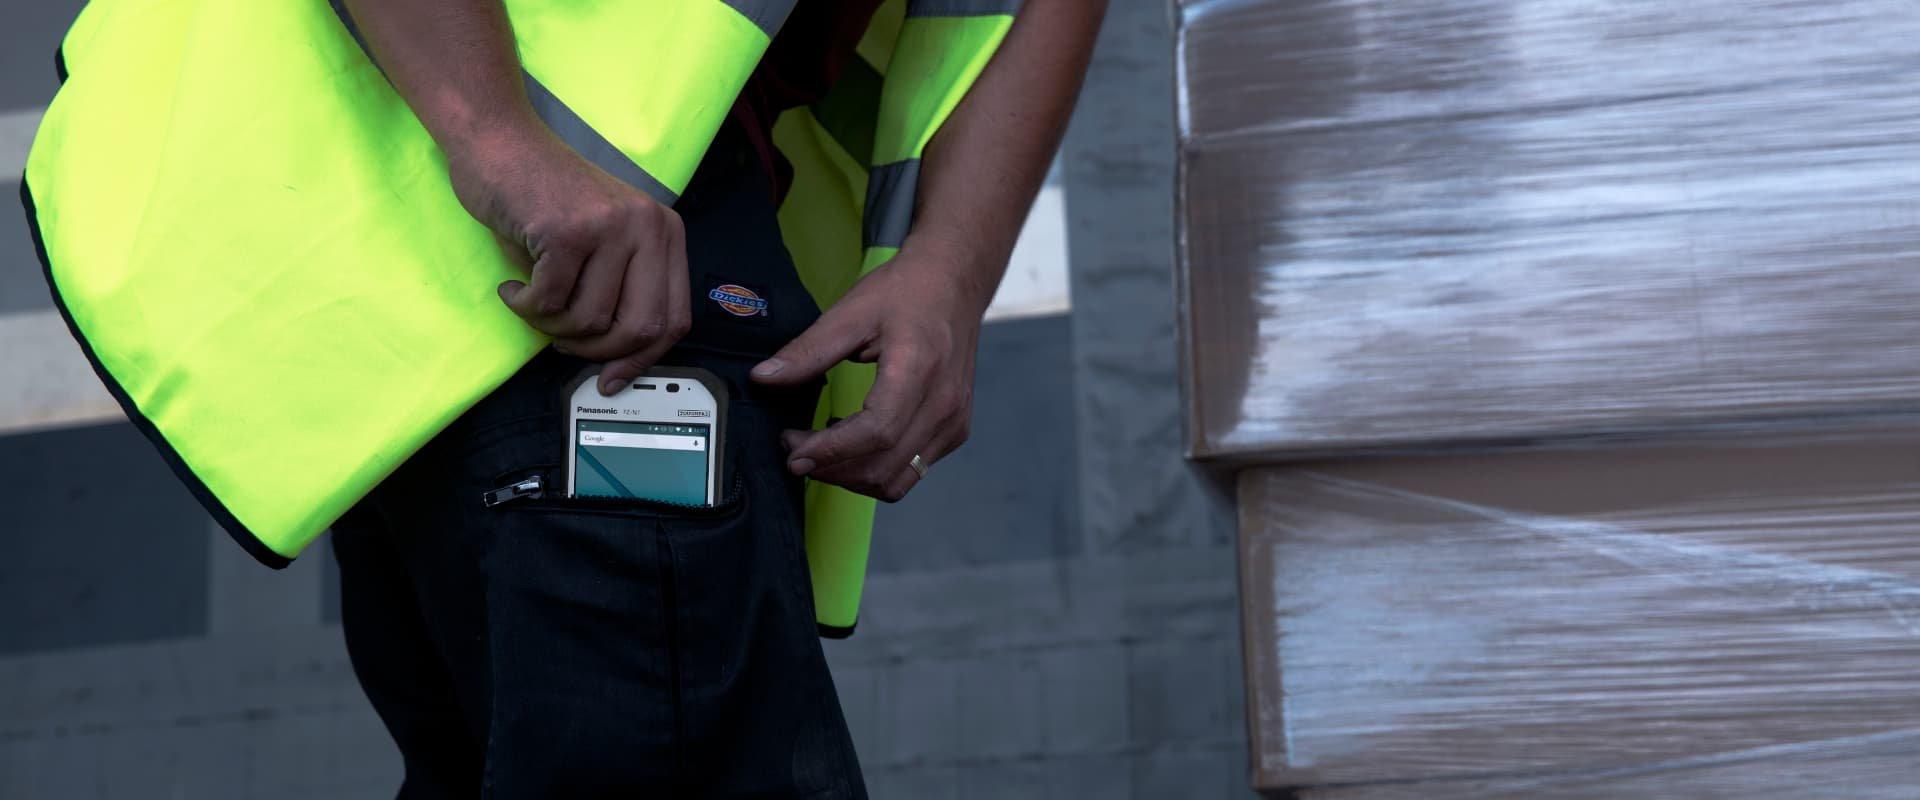 Smartphone Scanning im modernen Transport